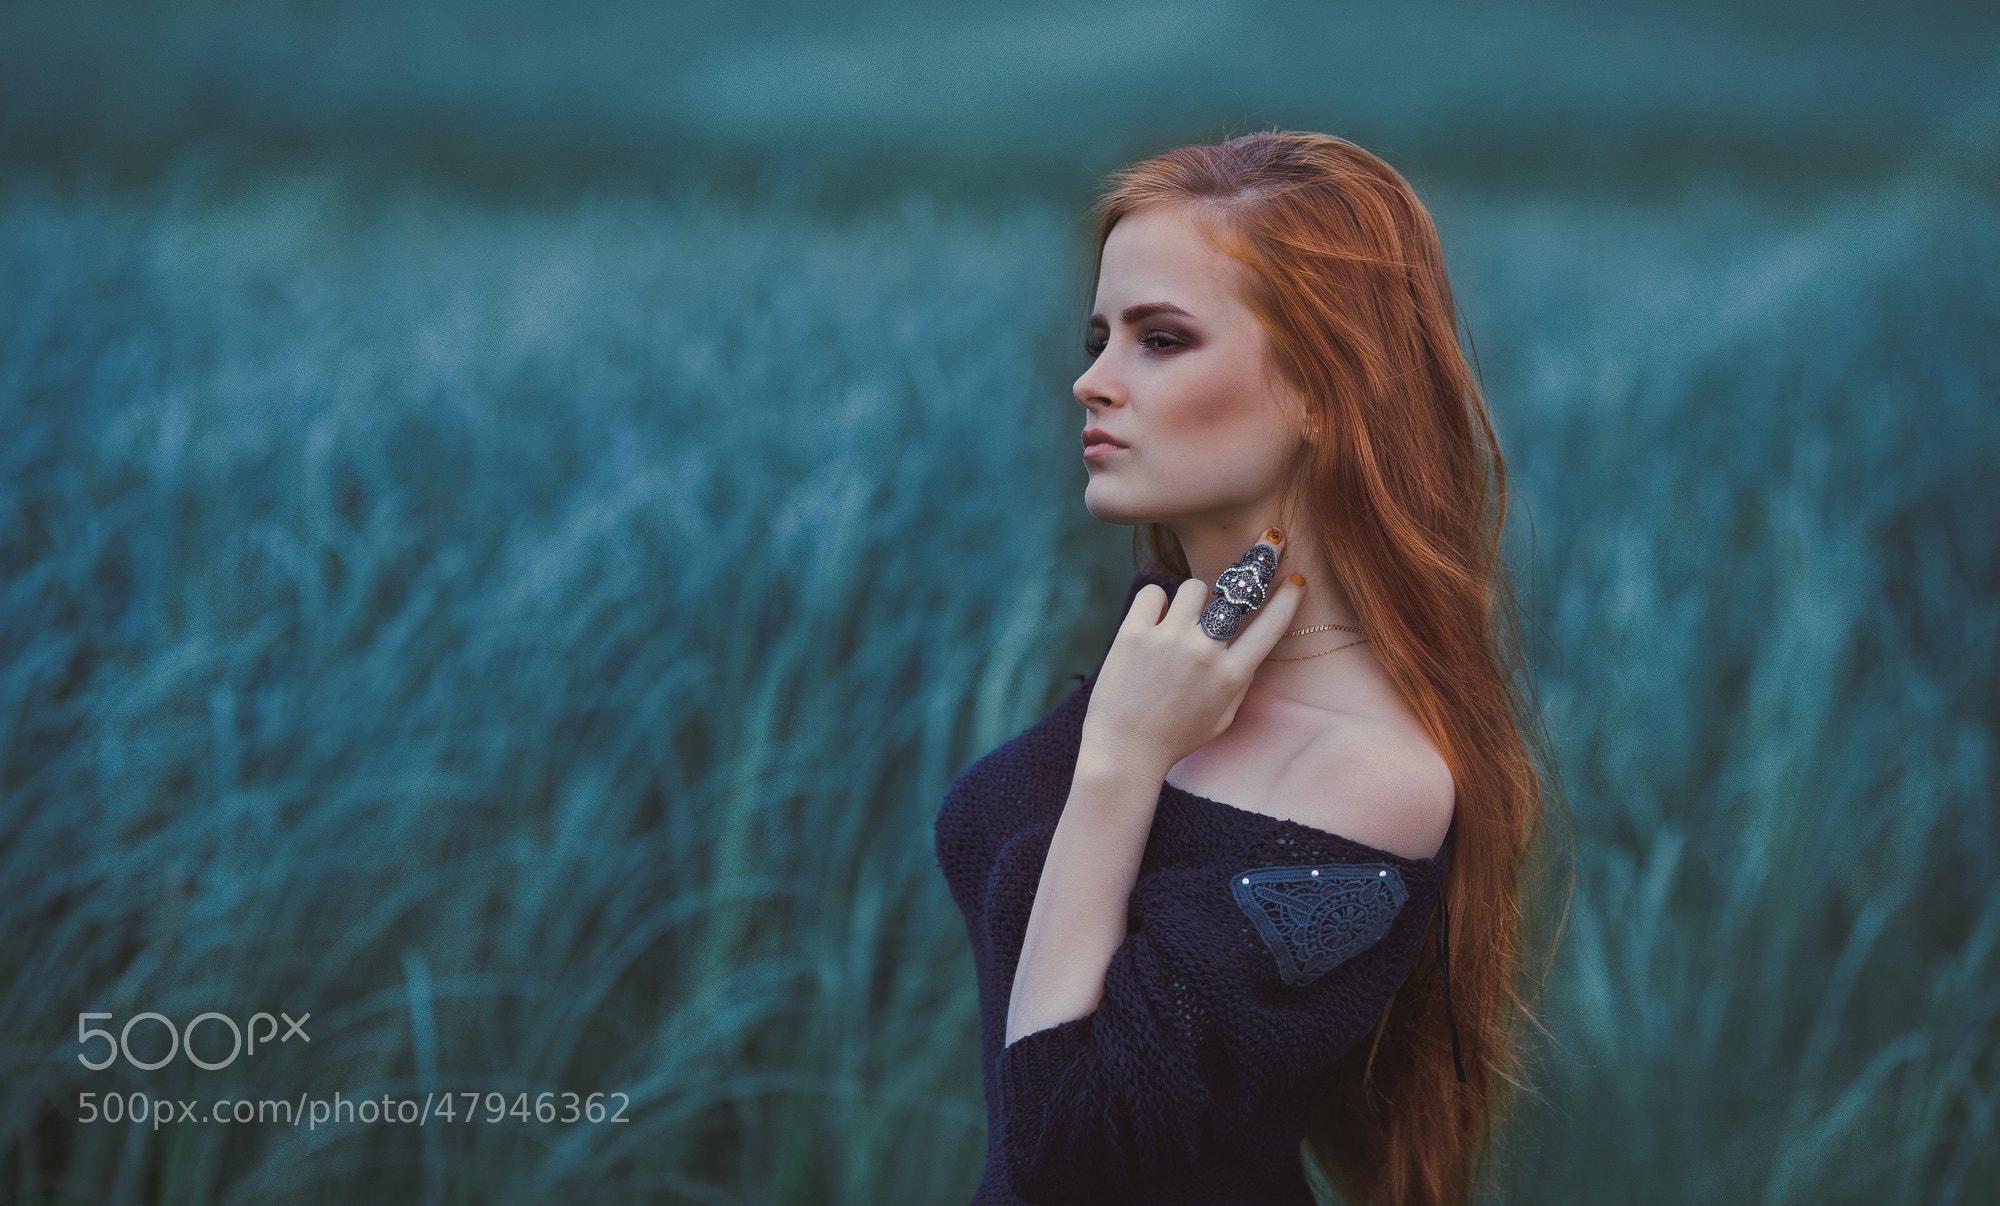 Photograph Masha Khudiakova by Валерия Агларова on 500px